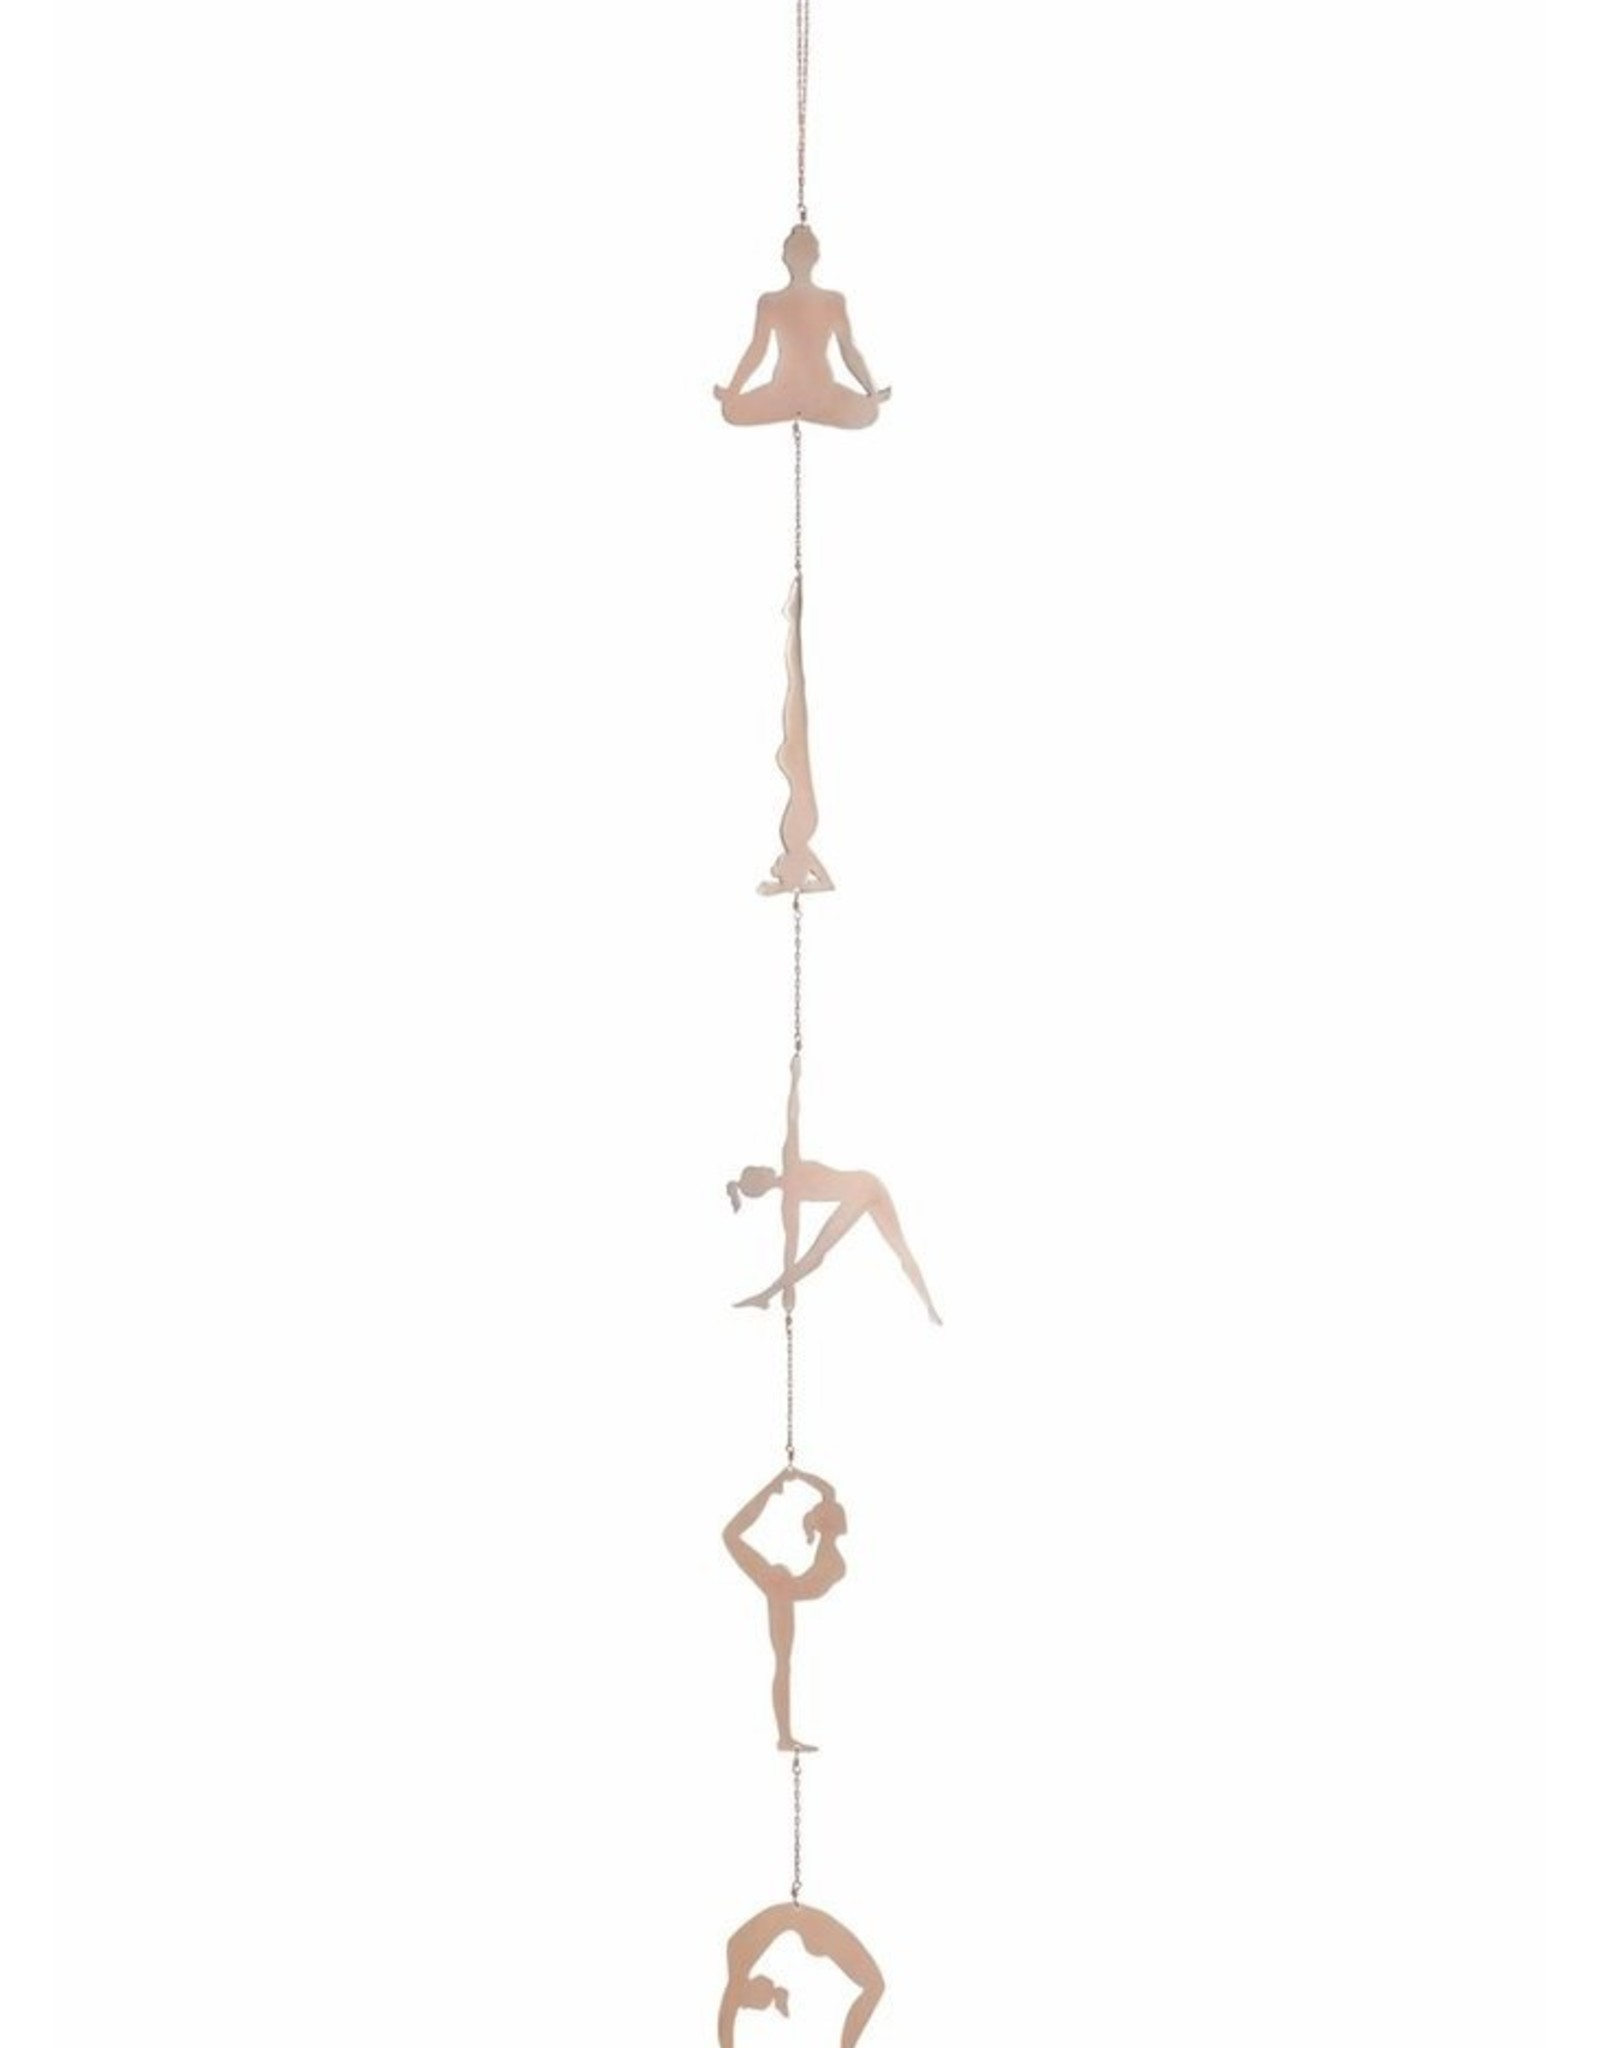 Ariana Ost Yoga Pose Wall Hanging